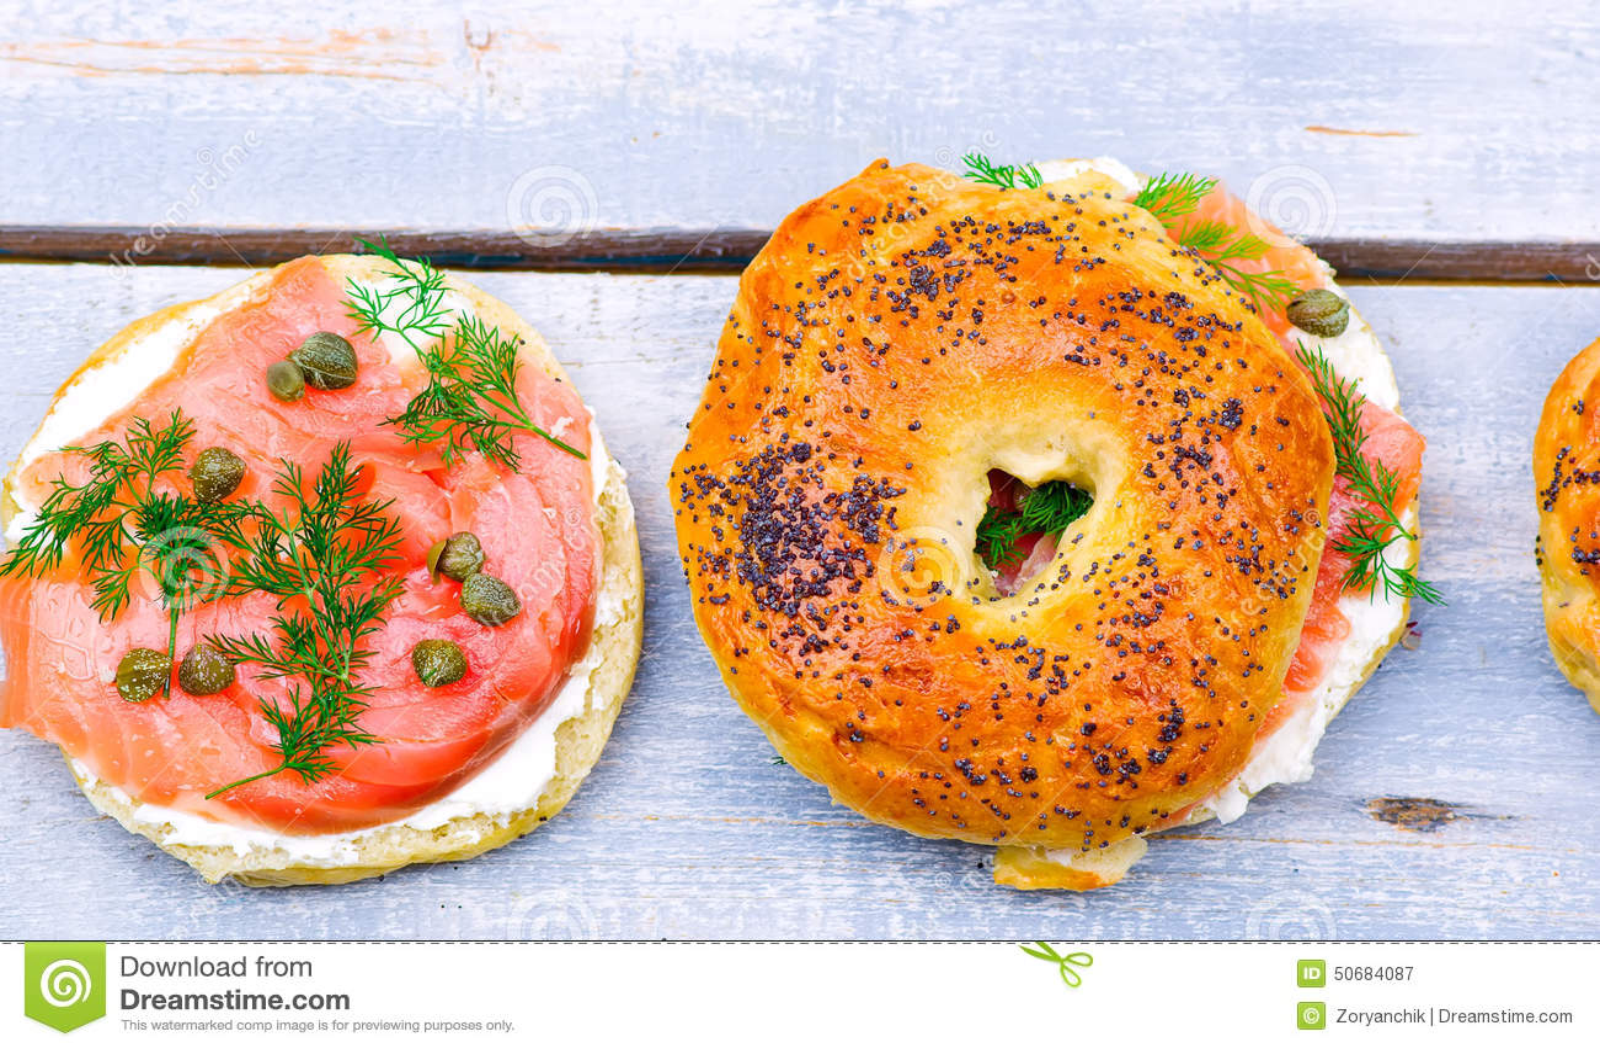 Download 百吉卷用熏制鲑鱼和乳脂干酪 库存图片. 图片 包括有 午餐, 引诱的, 空白, 制动手, 美食, 熏制, 巴西 - 50684087